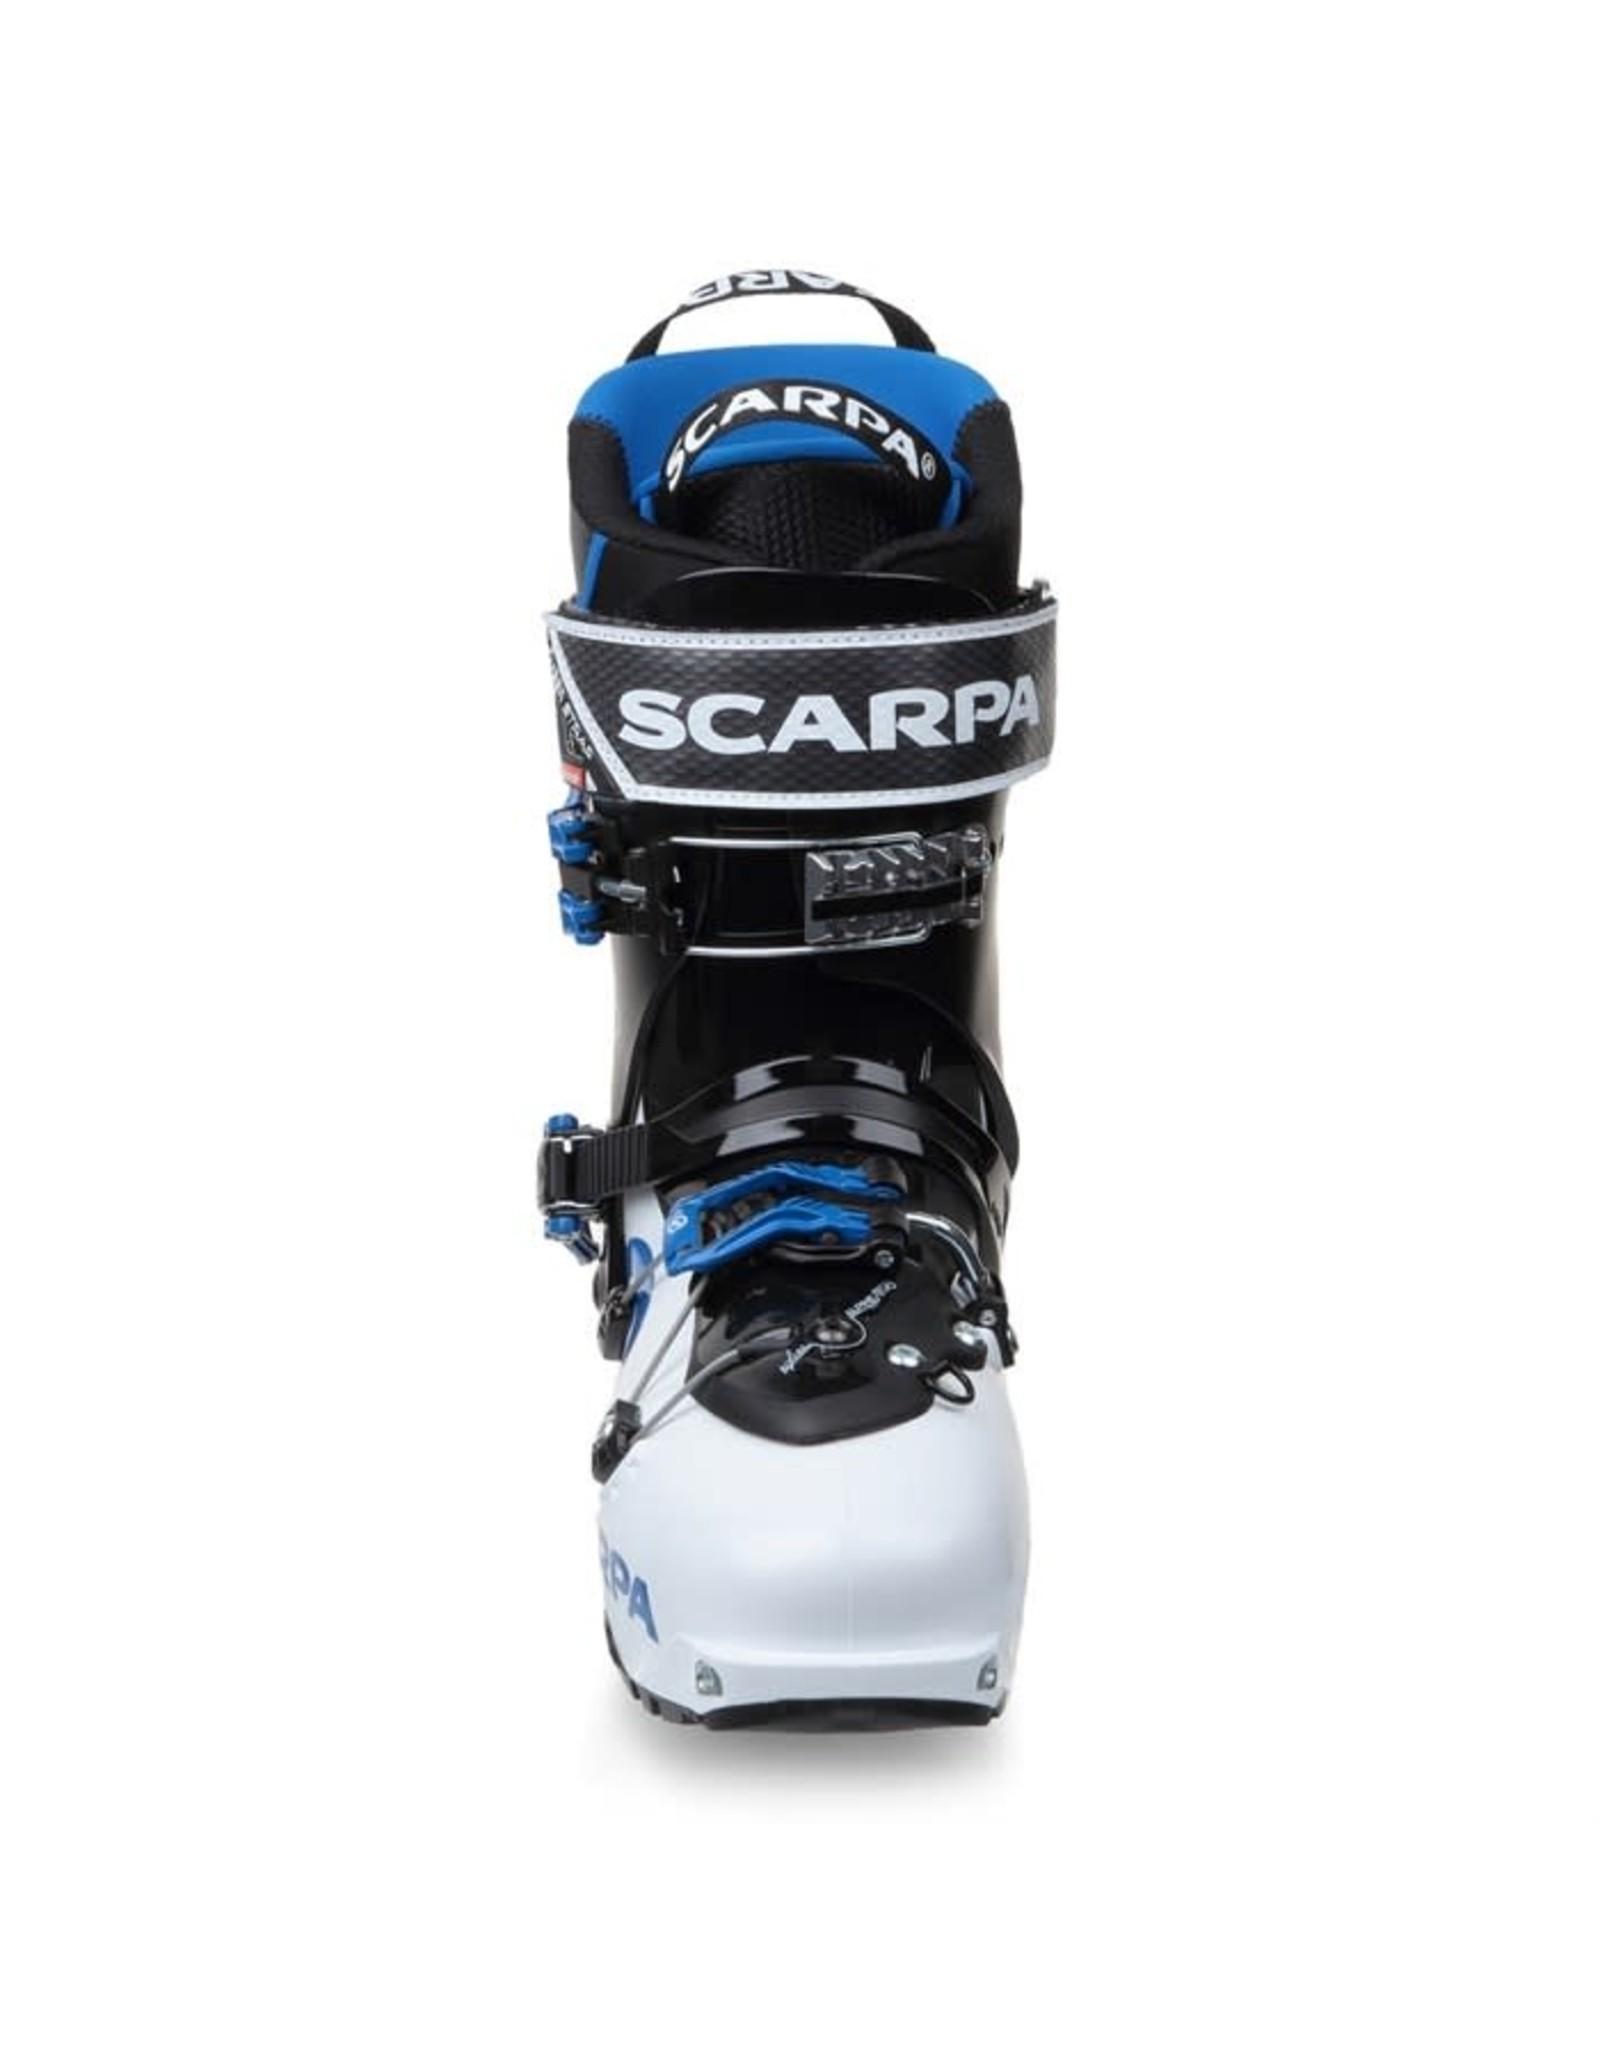 Scarpa Bottes de ski Scarpa Maestrale RS (2020) - Hommes